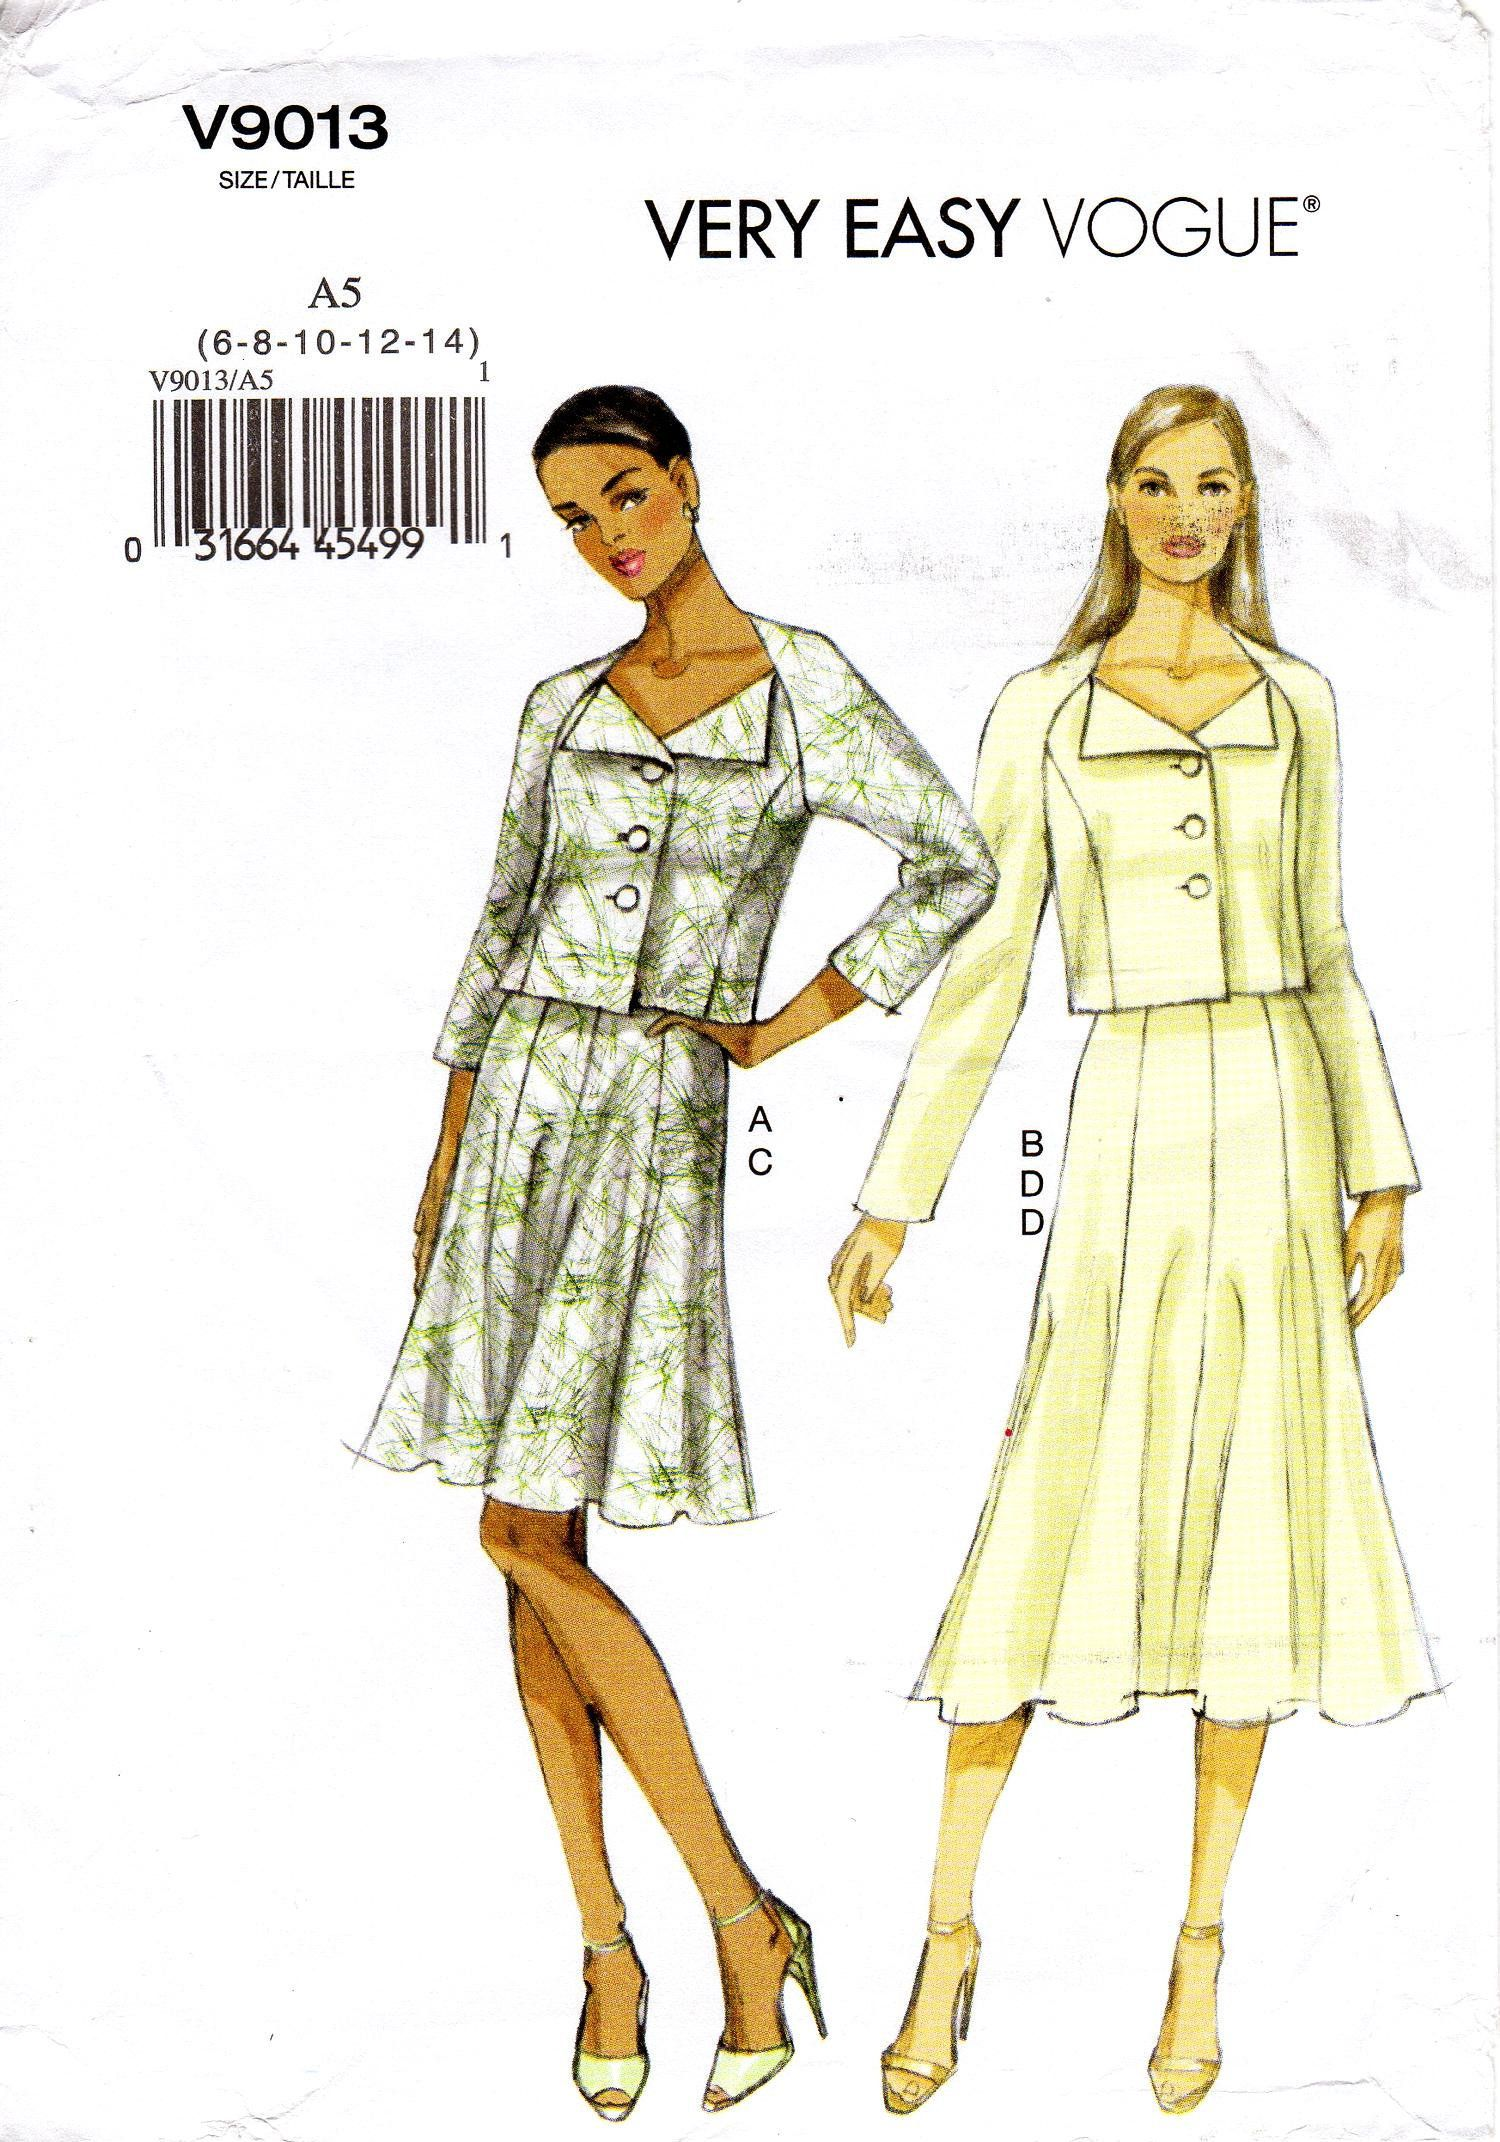 Sz 6 8 10 12 14 Vogue Separates Pattern V9013 Misses Raglan